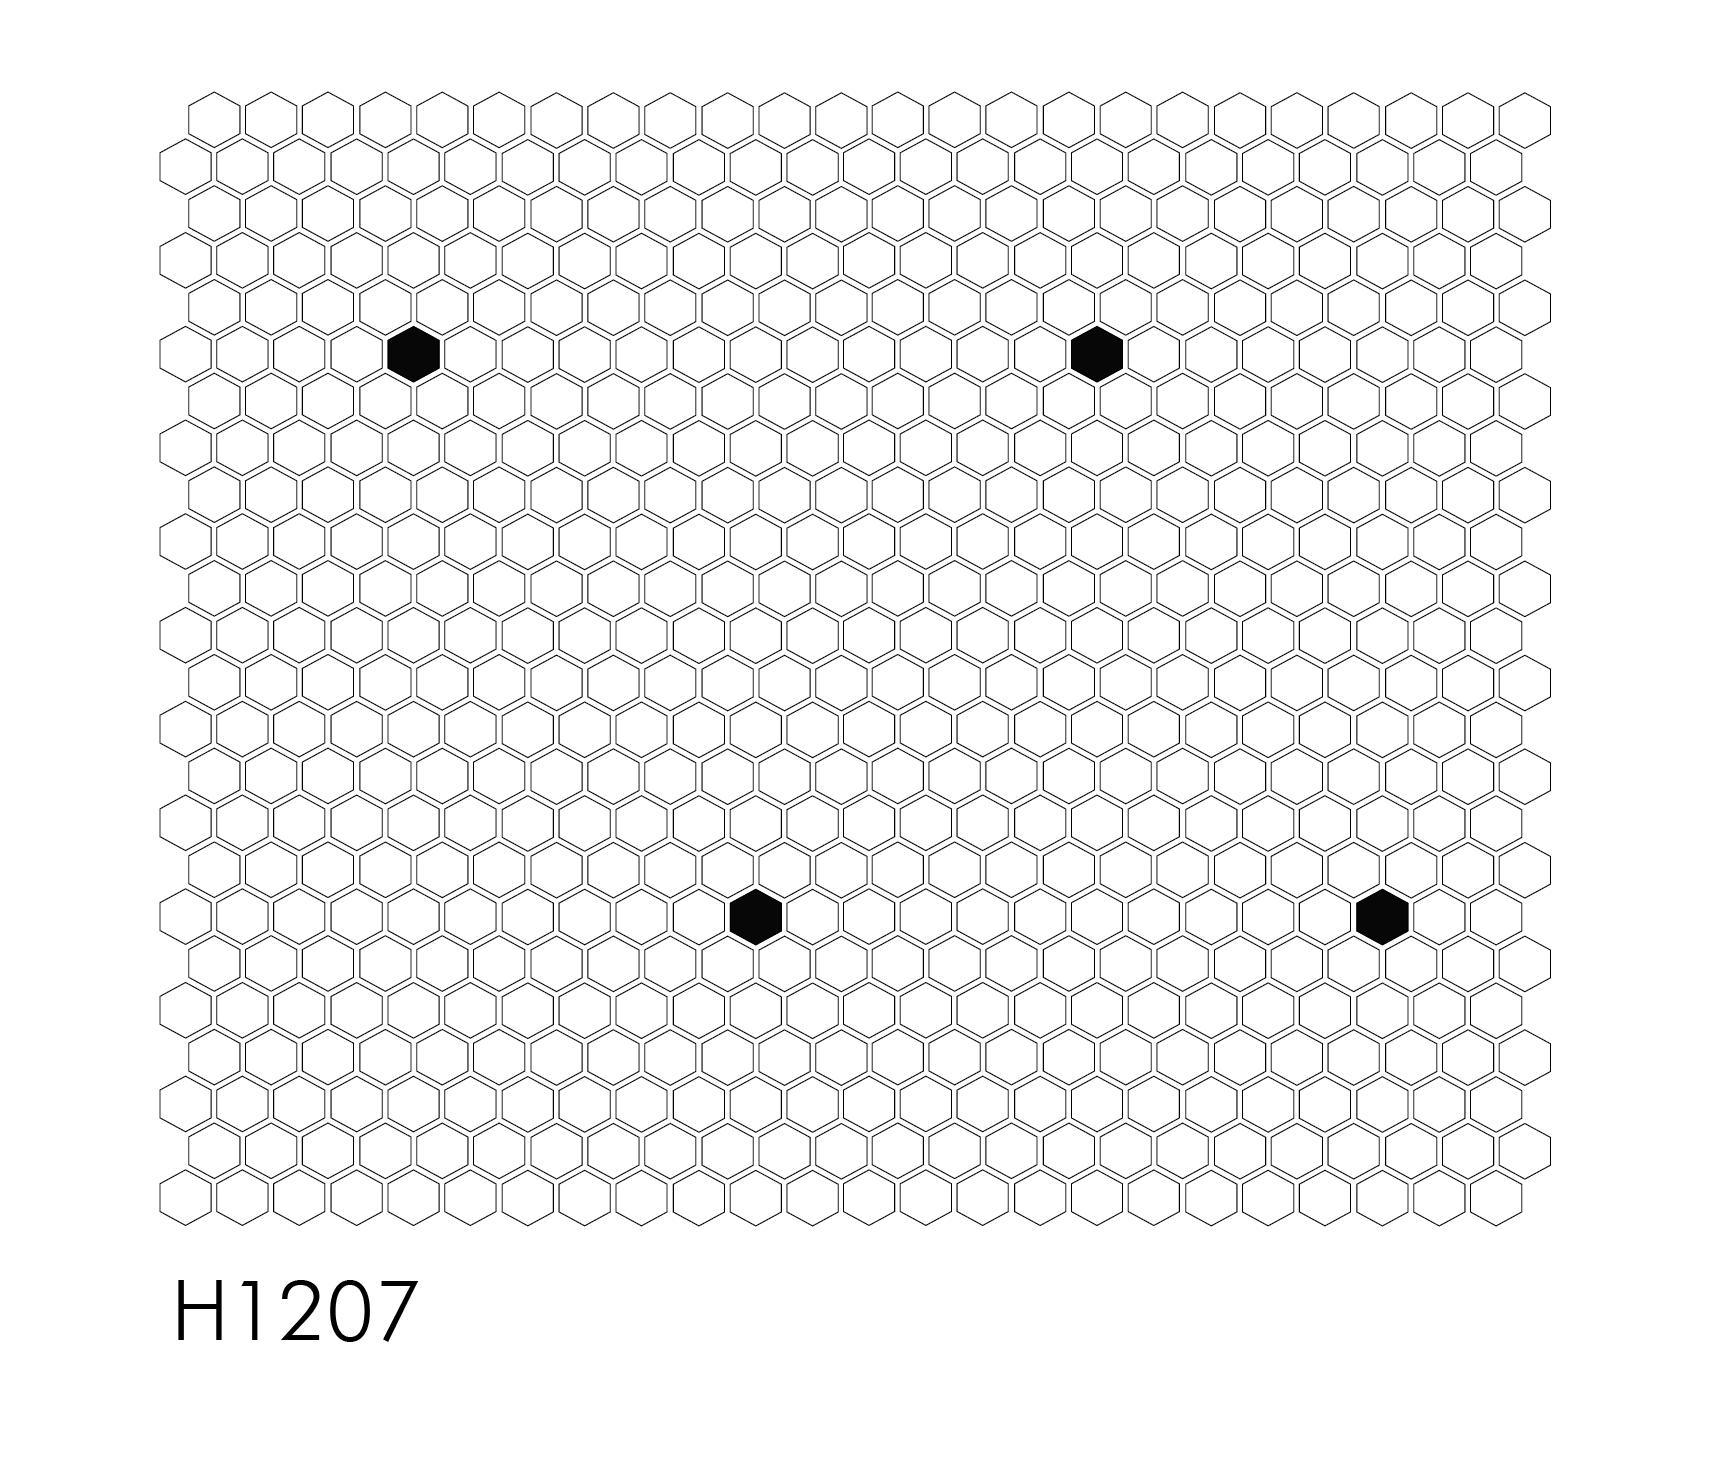 "H1207 Single Dot 1"" Hexagon Mosaic"